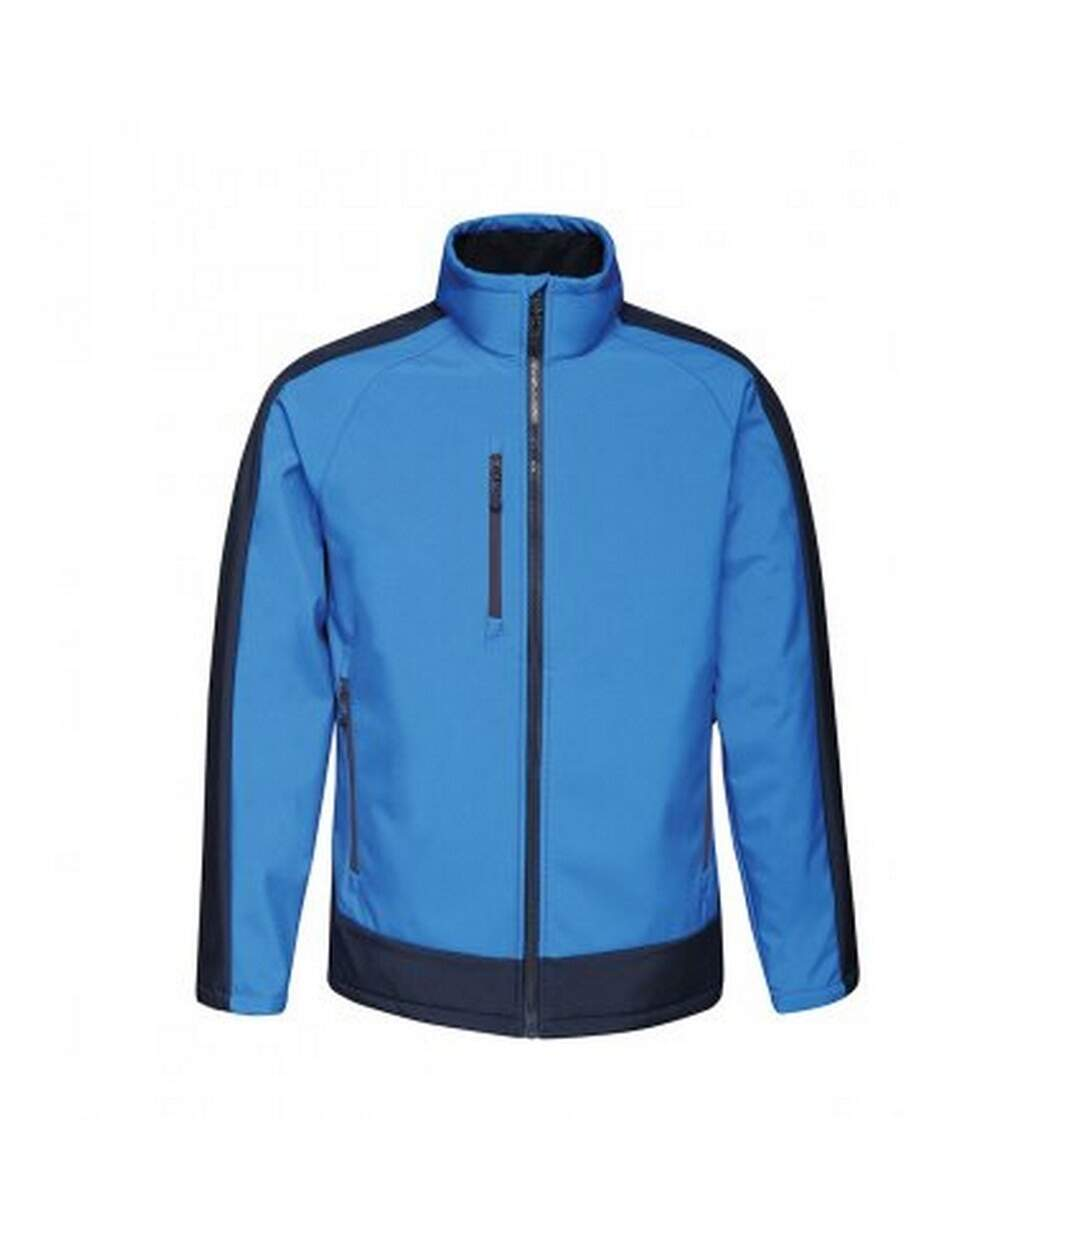 Regatta - Veste Softshell Contrast - Homme (Bleu roi / bleu marine) - UTPC3318